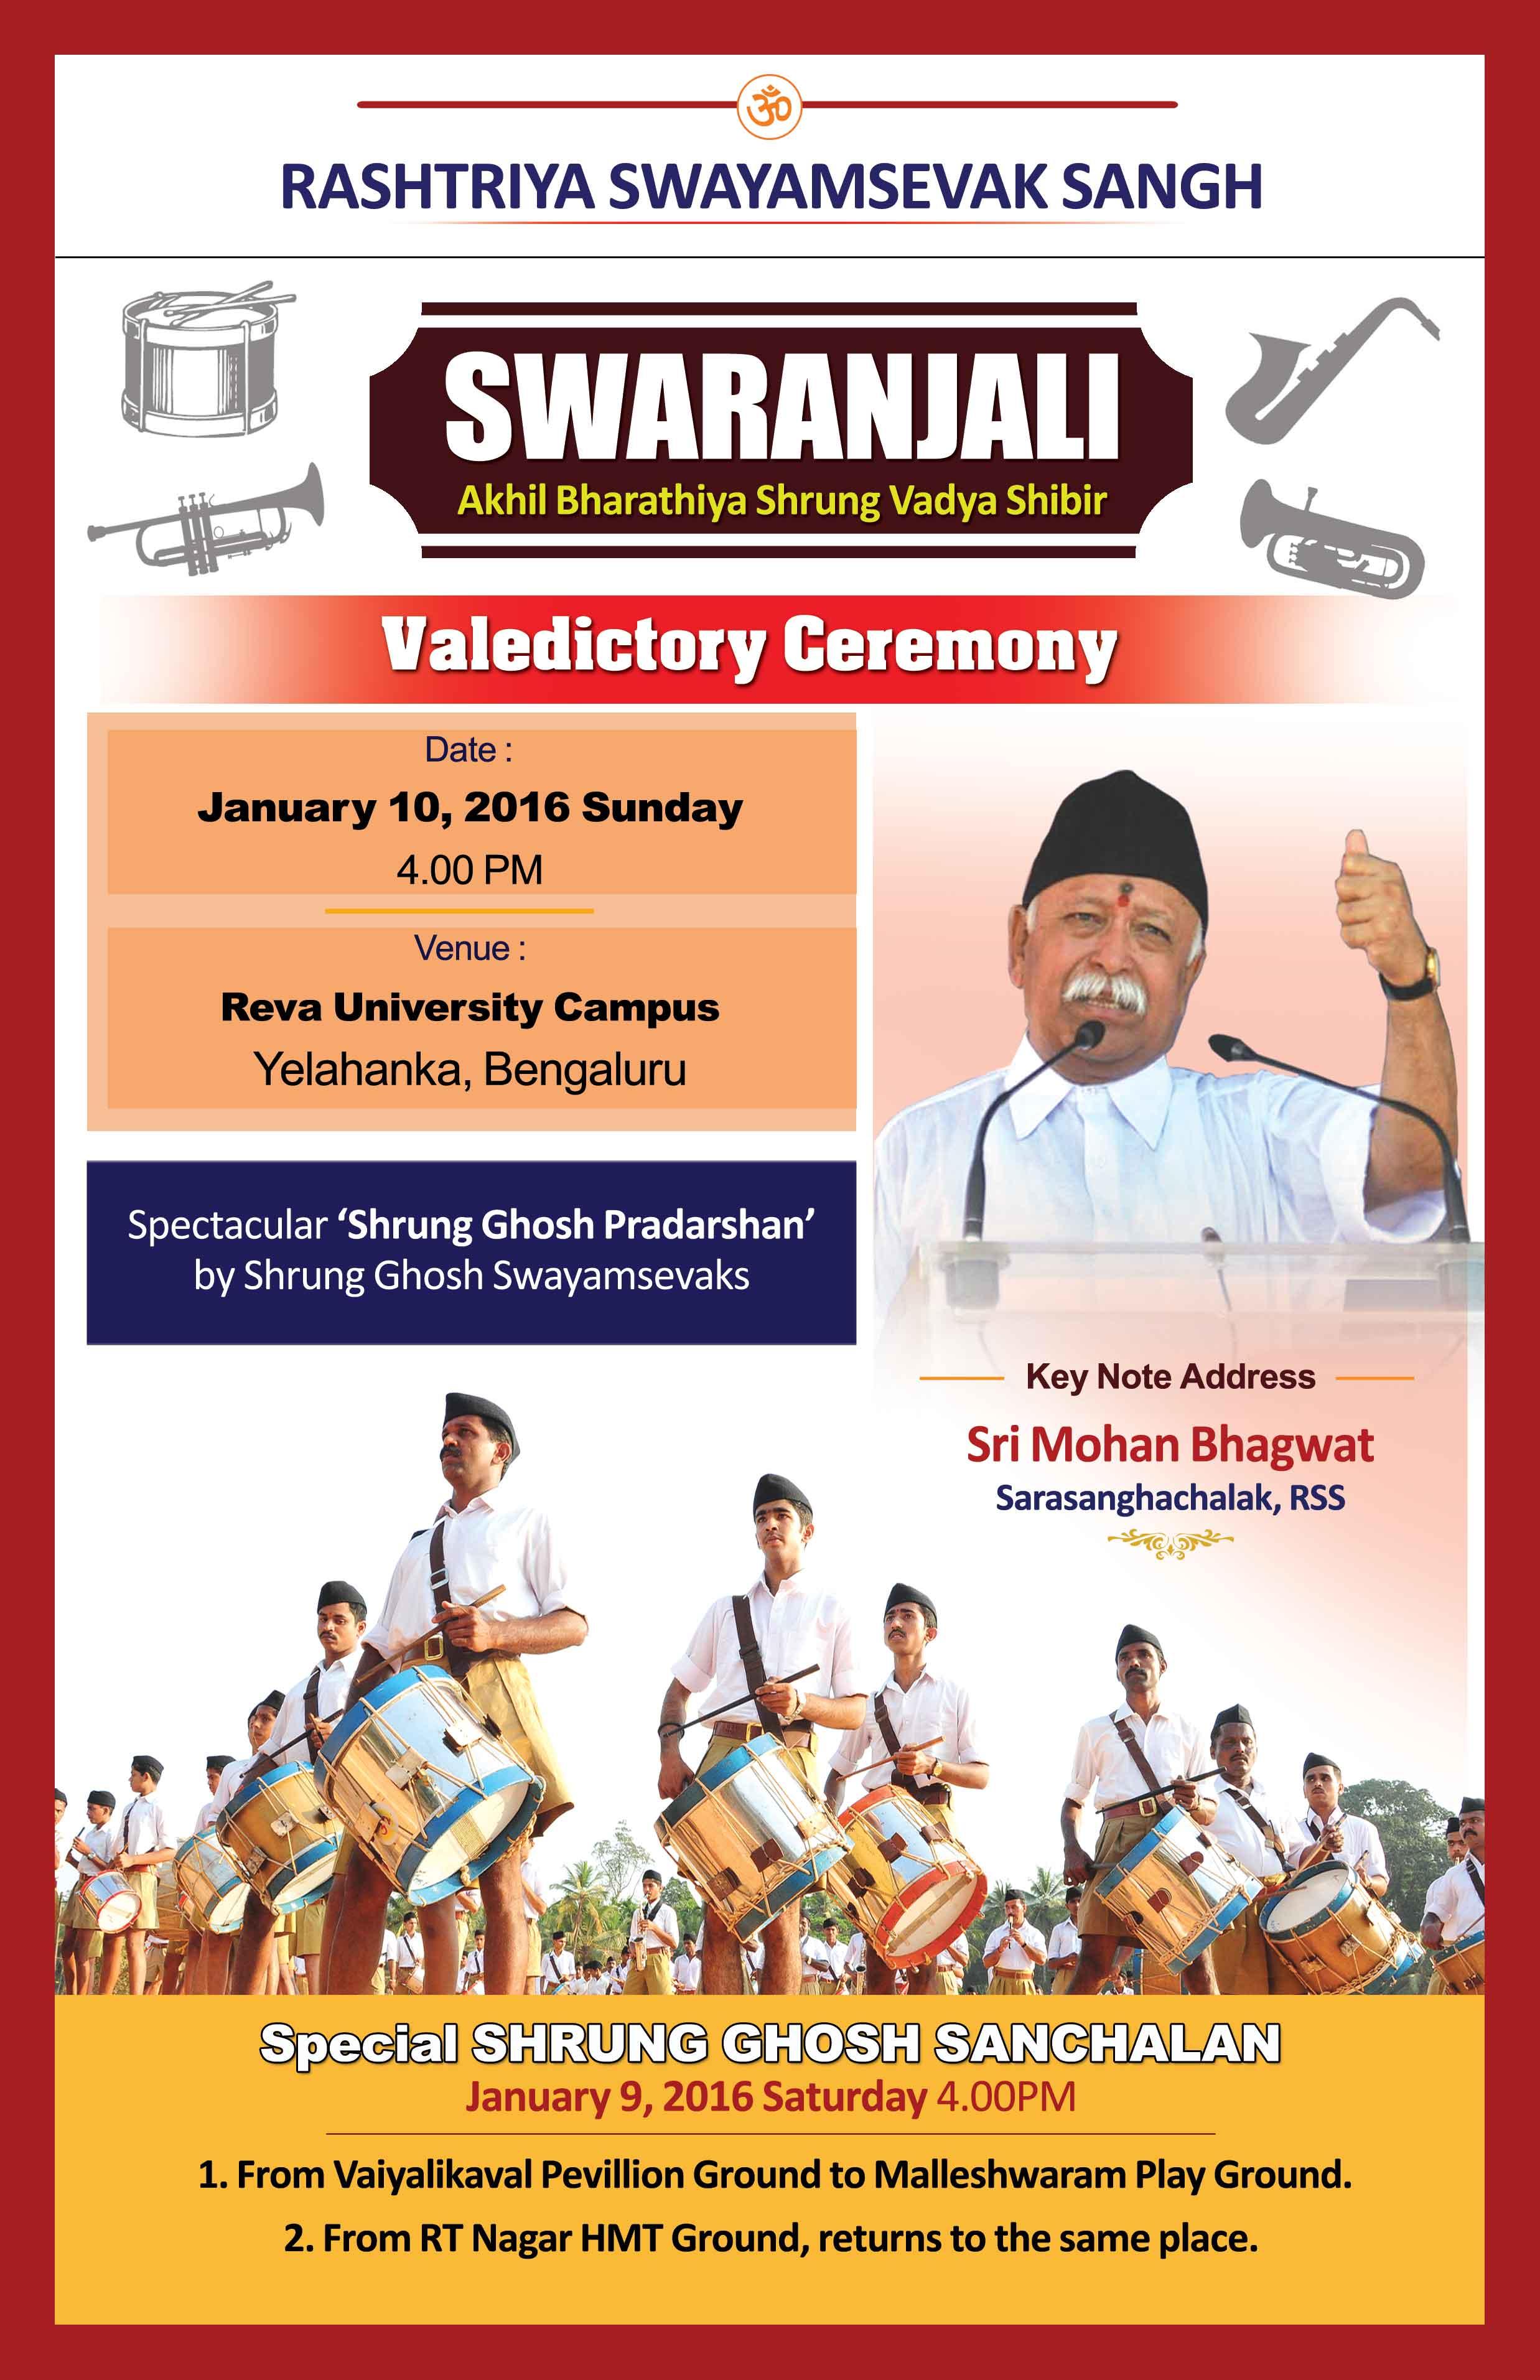 RSS Akhil Bharatiya Shrunga Ghosh Shibir 'SWARANJALI' to be held on January 7-10, 2016 at Bengaluru; Sarasanghachalak Mohan Bhagwat to address Valedictory